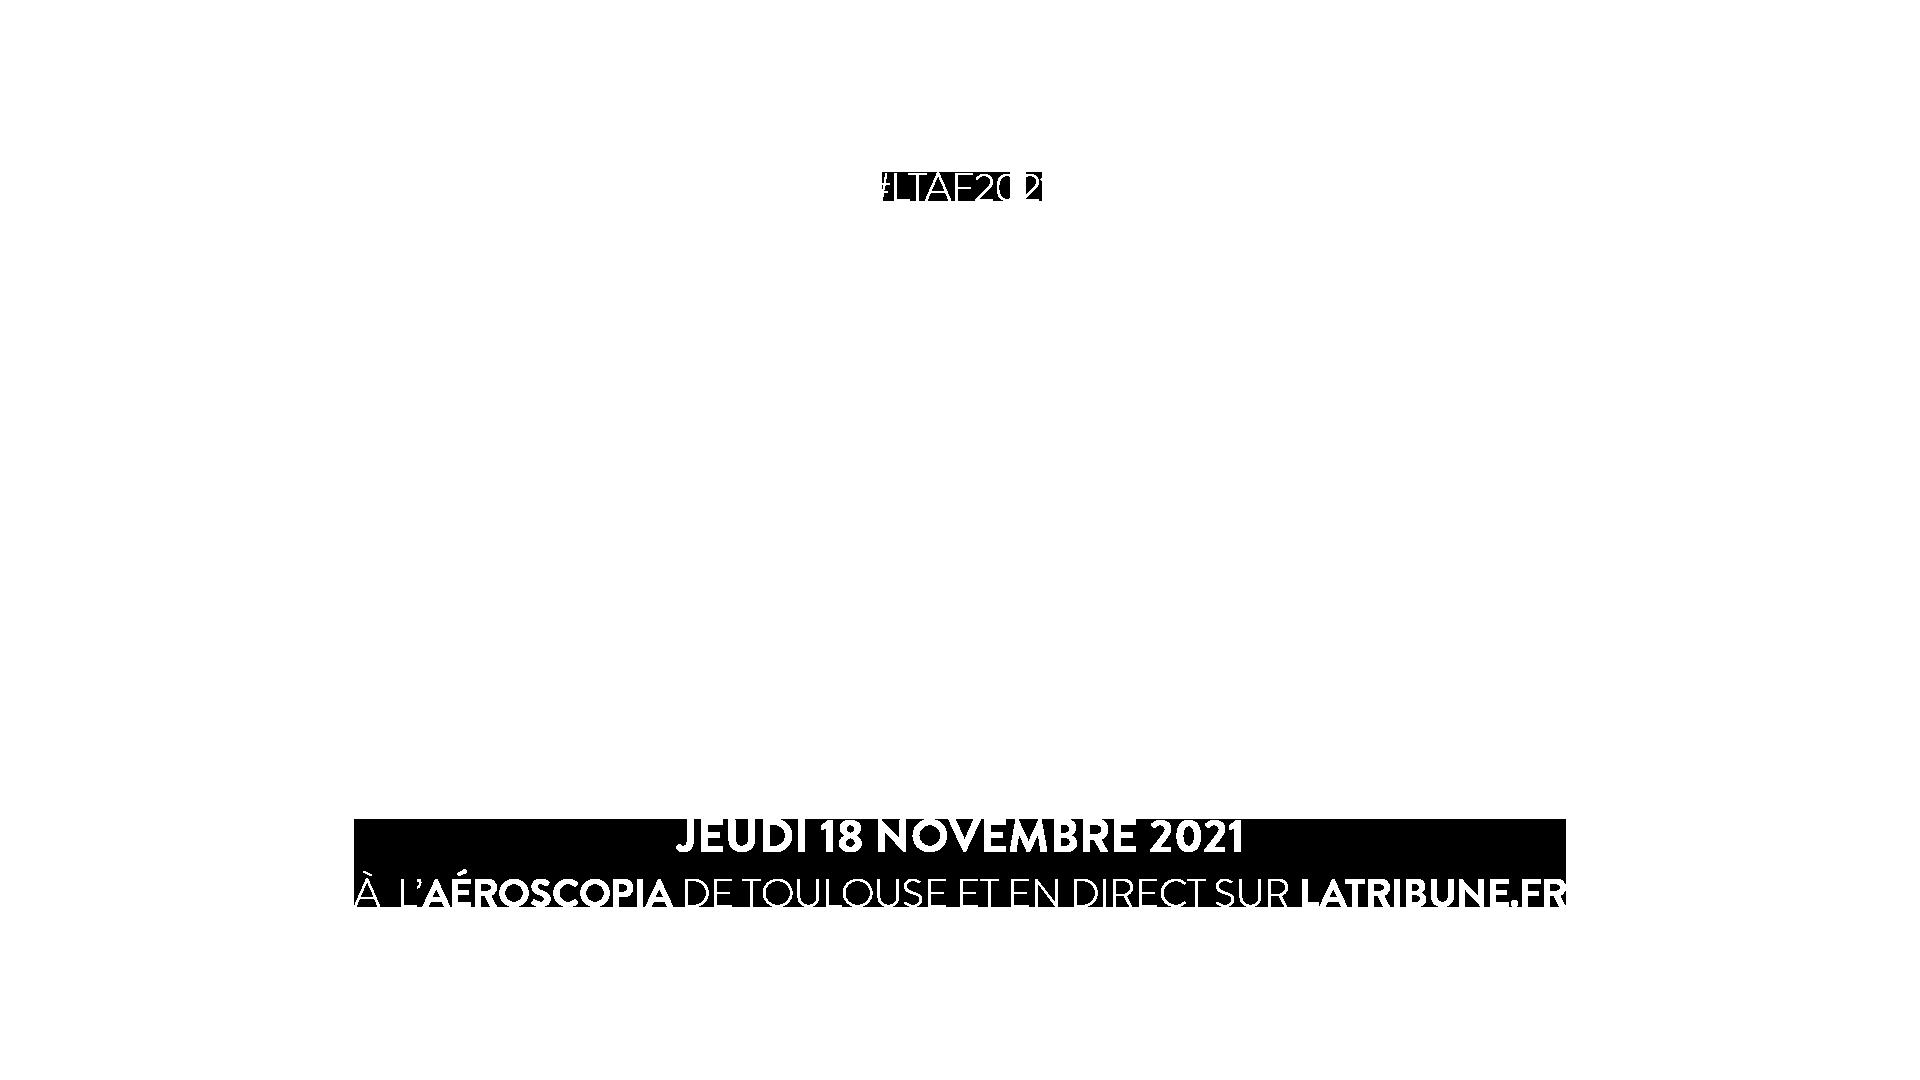 AEROFORUM_2021_SITE_1920x1080